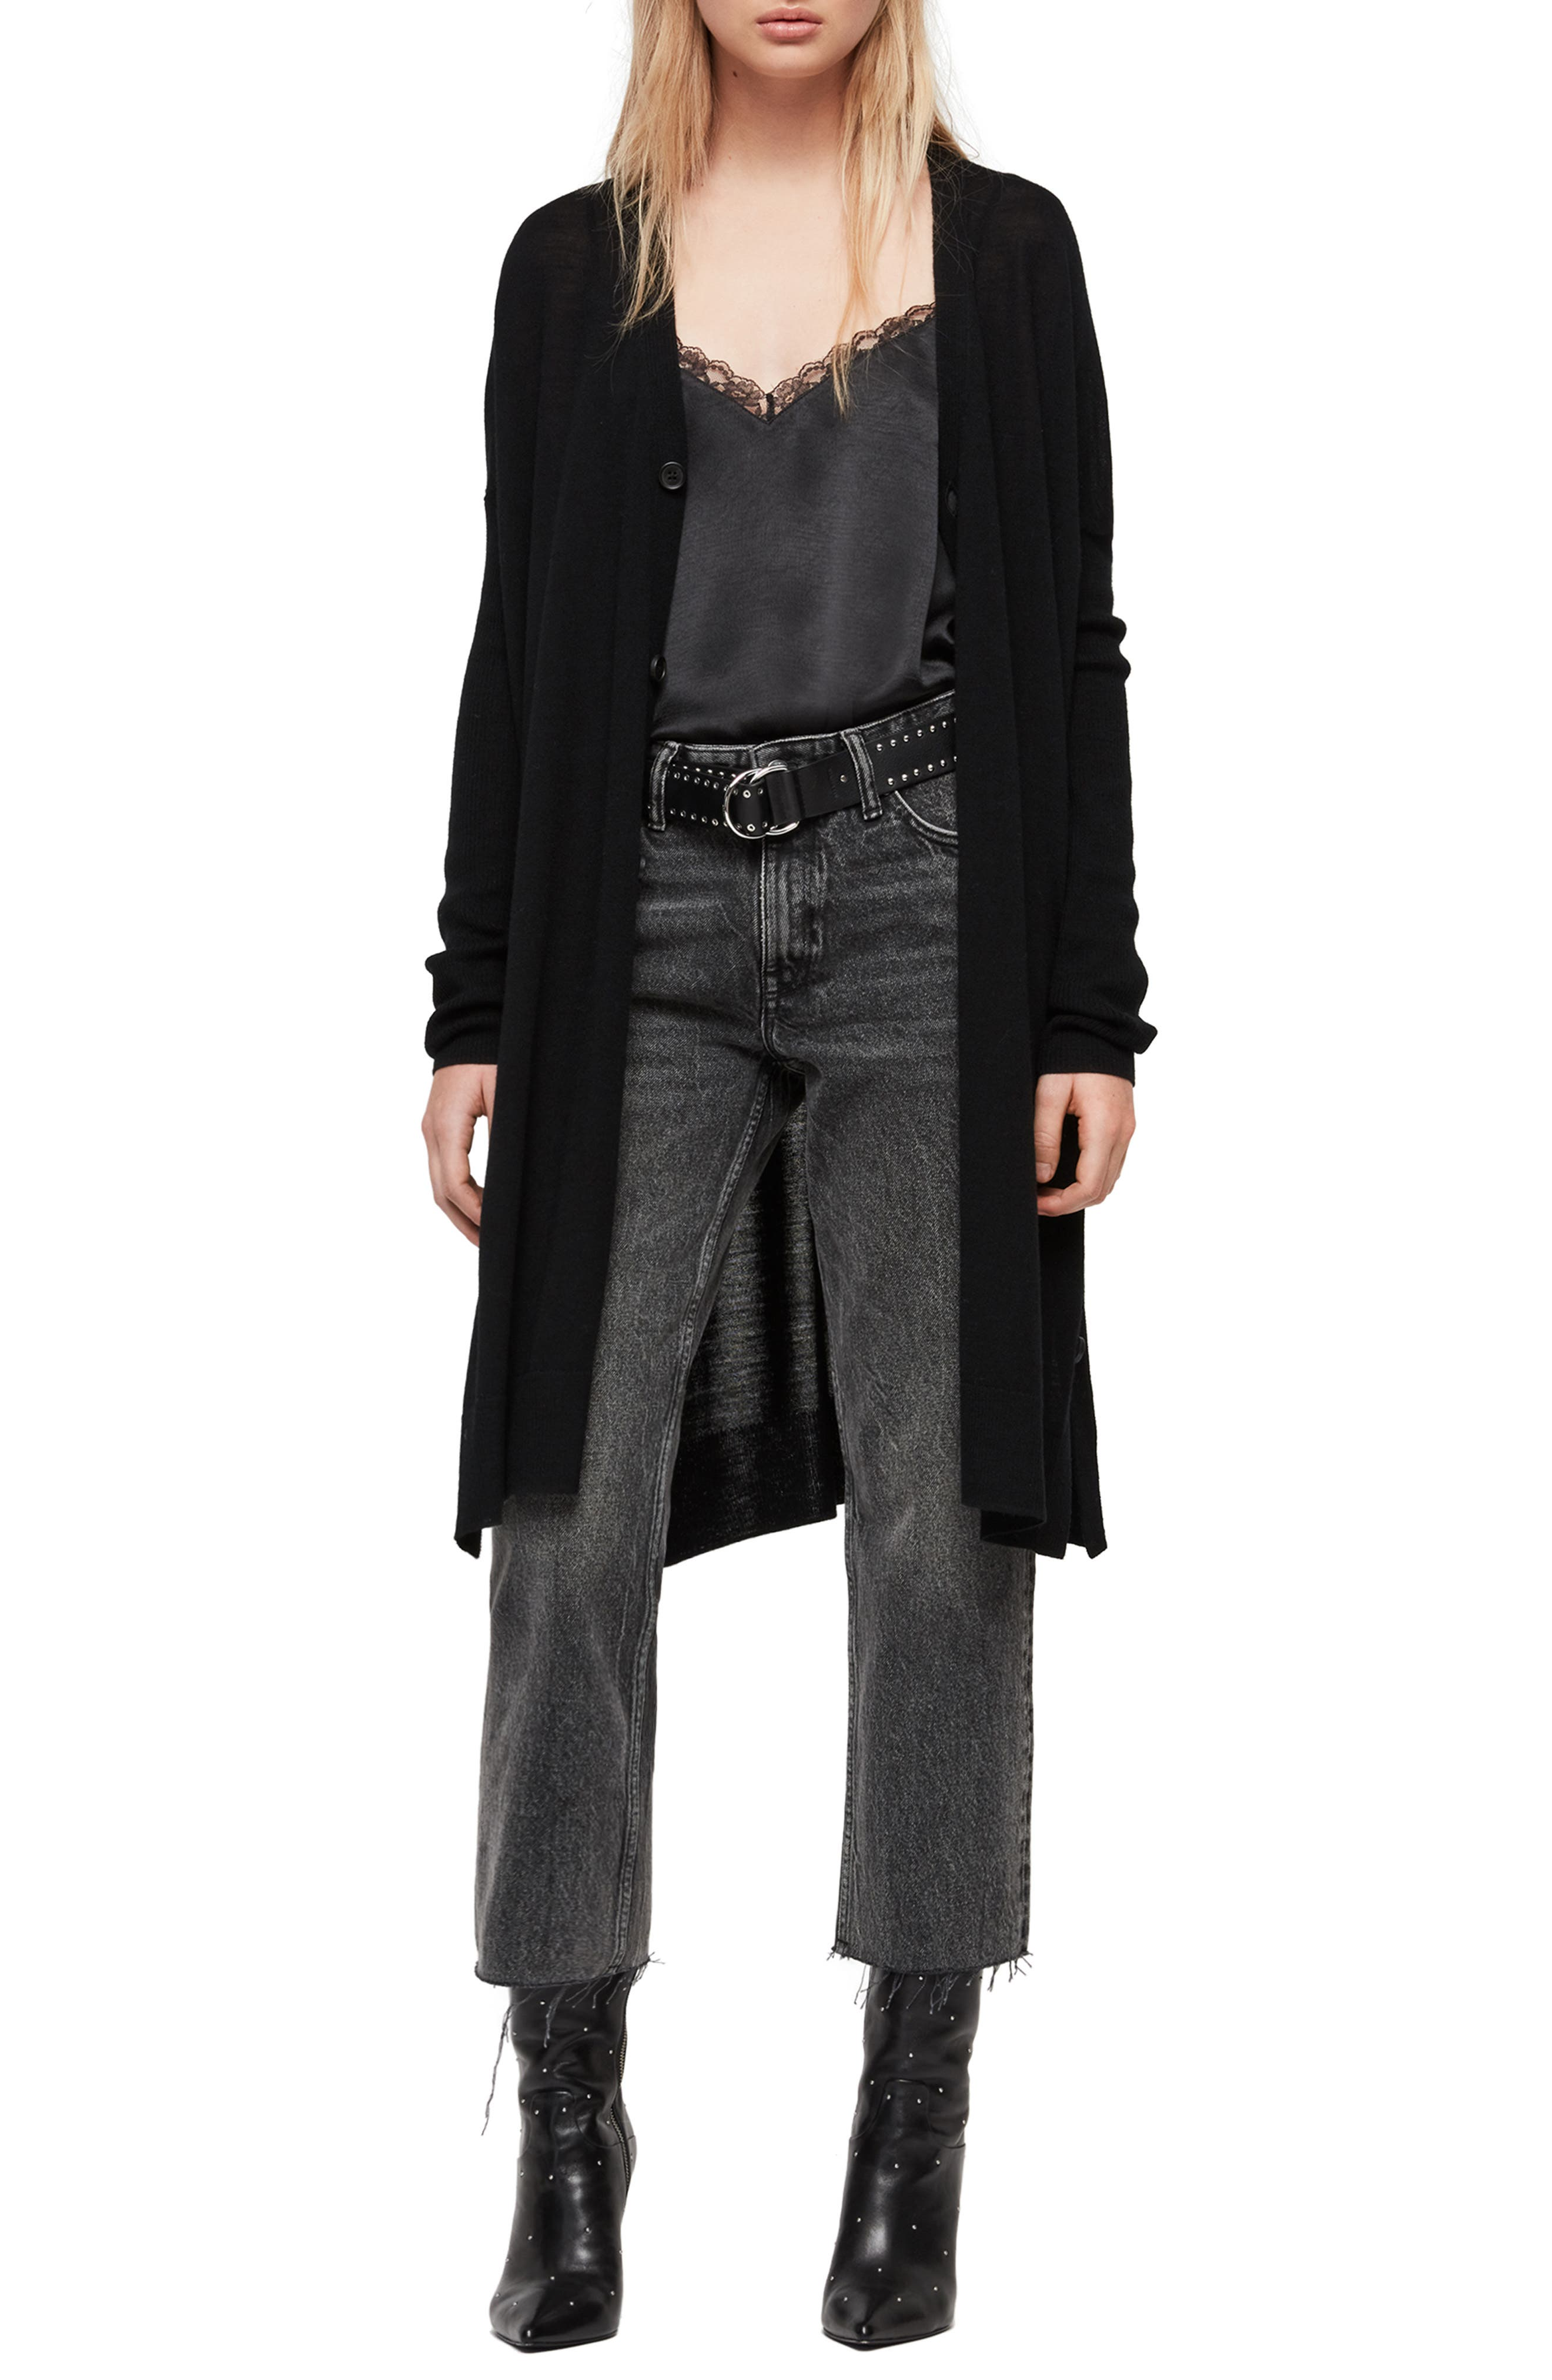 ALLSAINTS, Mori Merino Wool Cardigan, Main thumbnail 1, color, BLACK